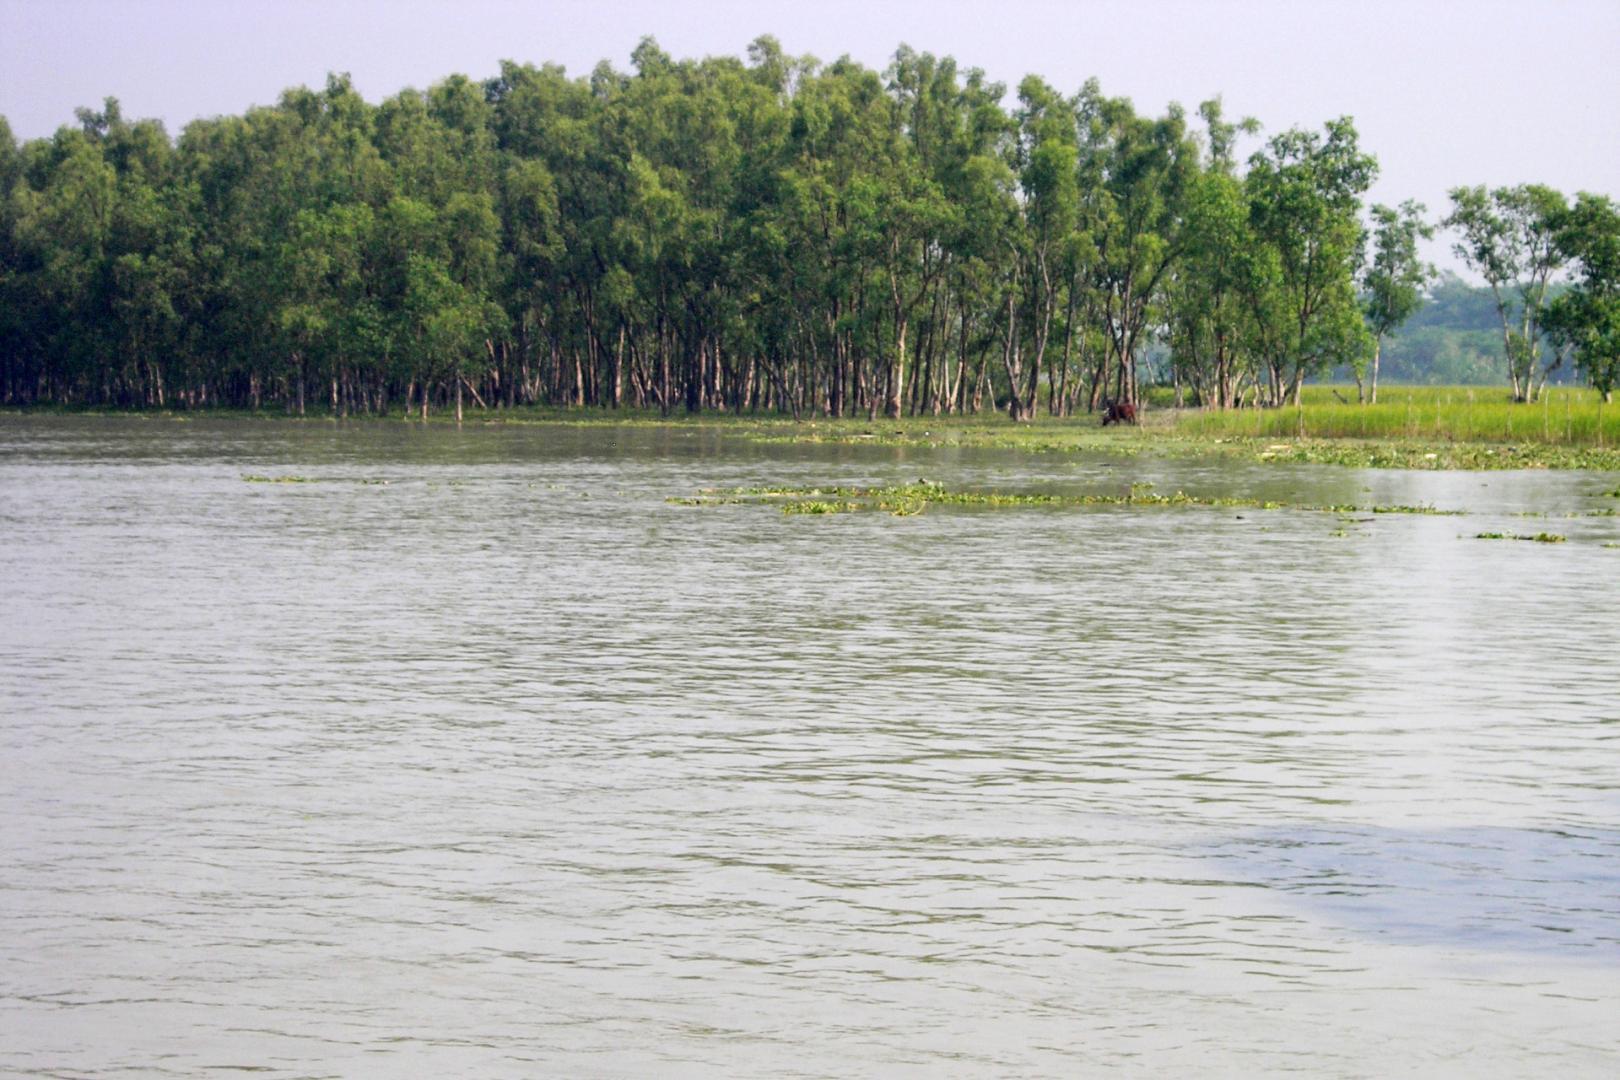 08_sund-26e_mangrove_05_psd.jpg